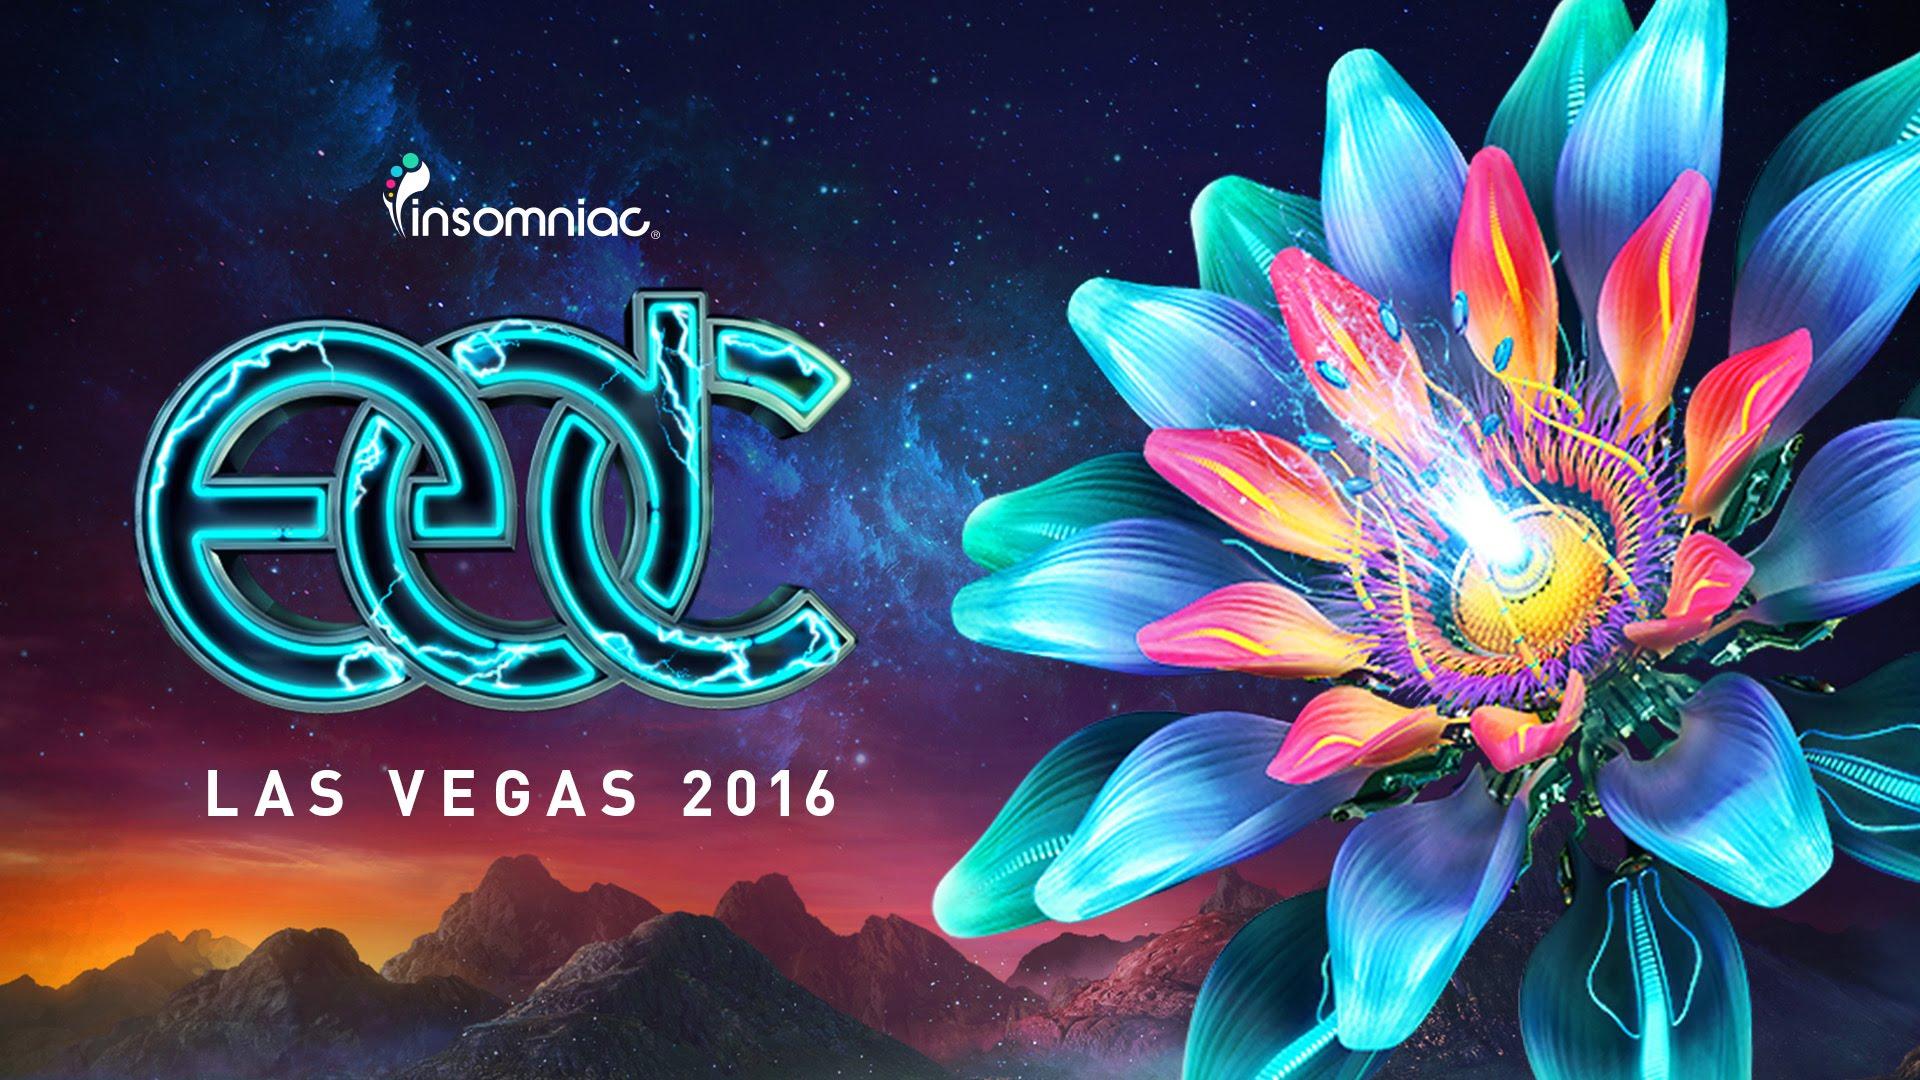 Edc Las Vegas 2016 Announces Dates